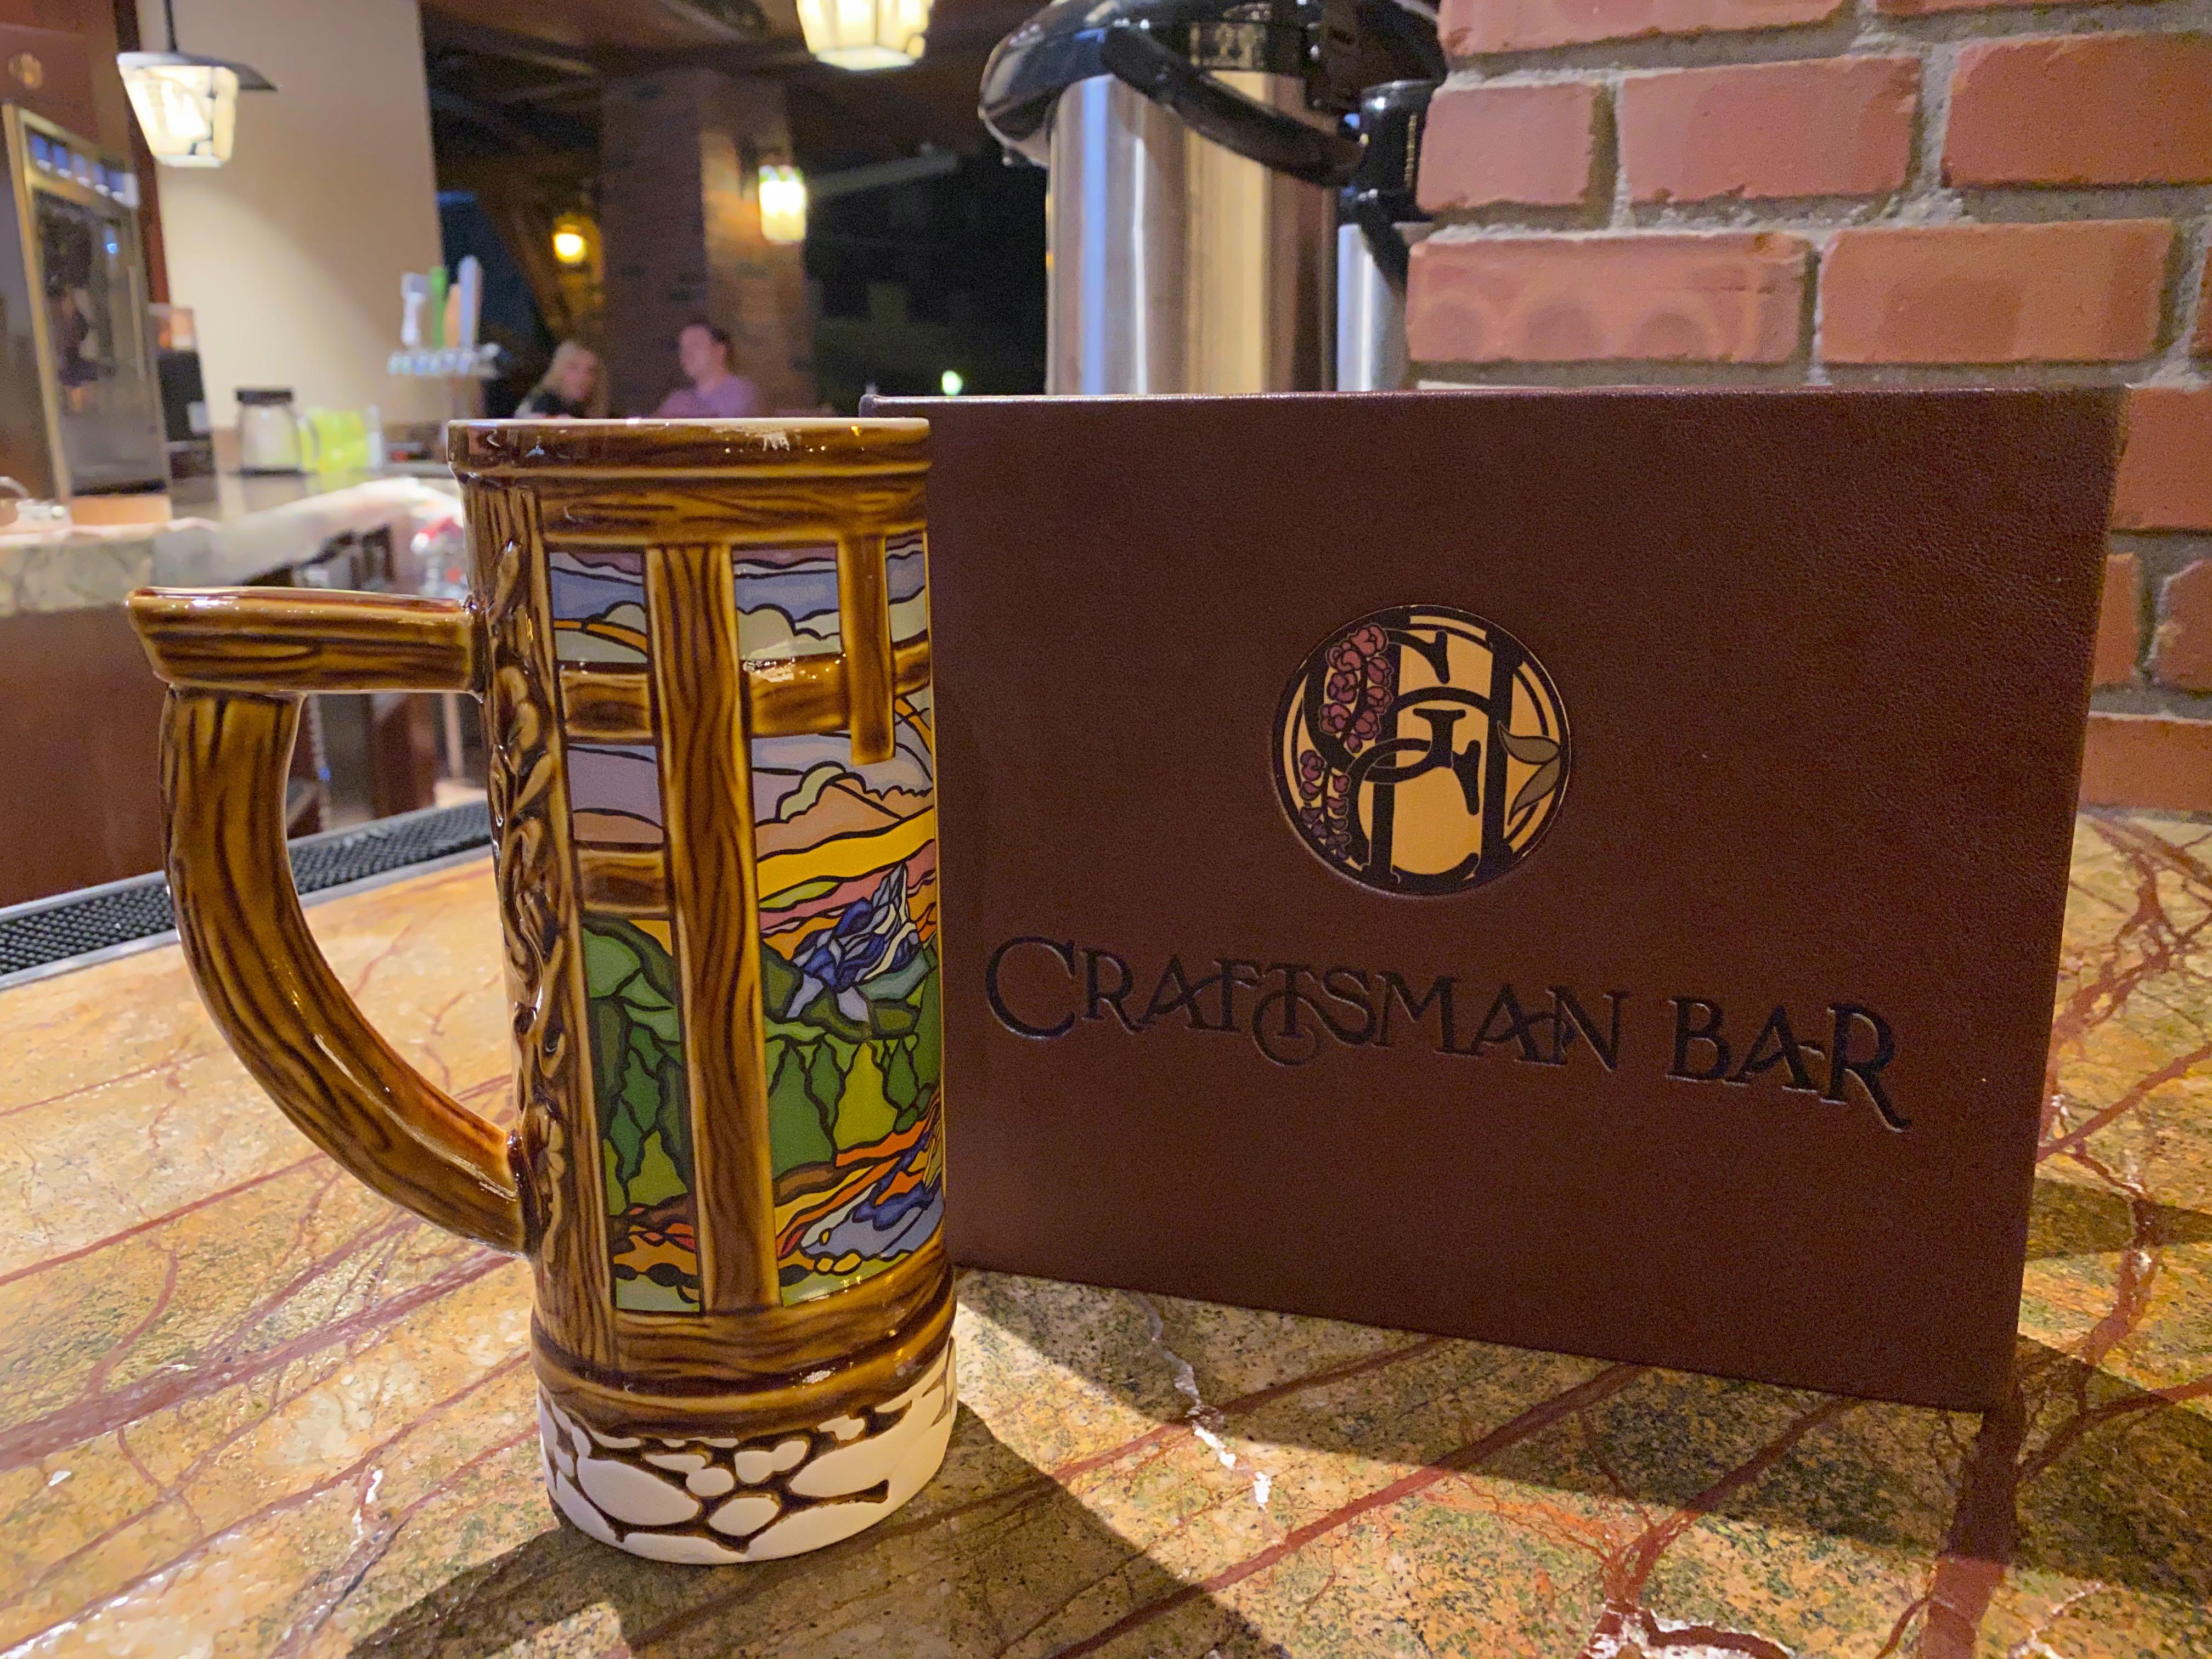 craftsman-bar-mug-02-23-2020-7.jpg